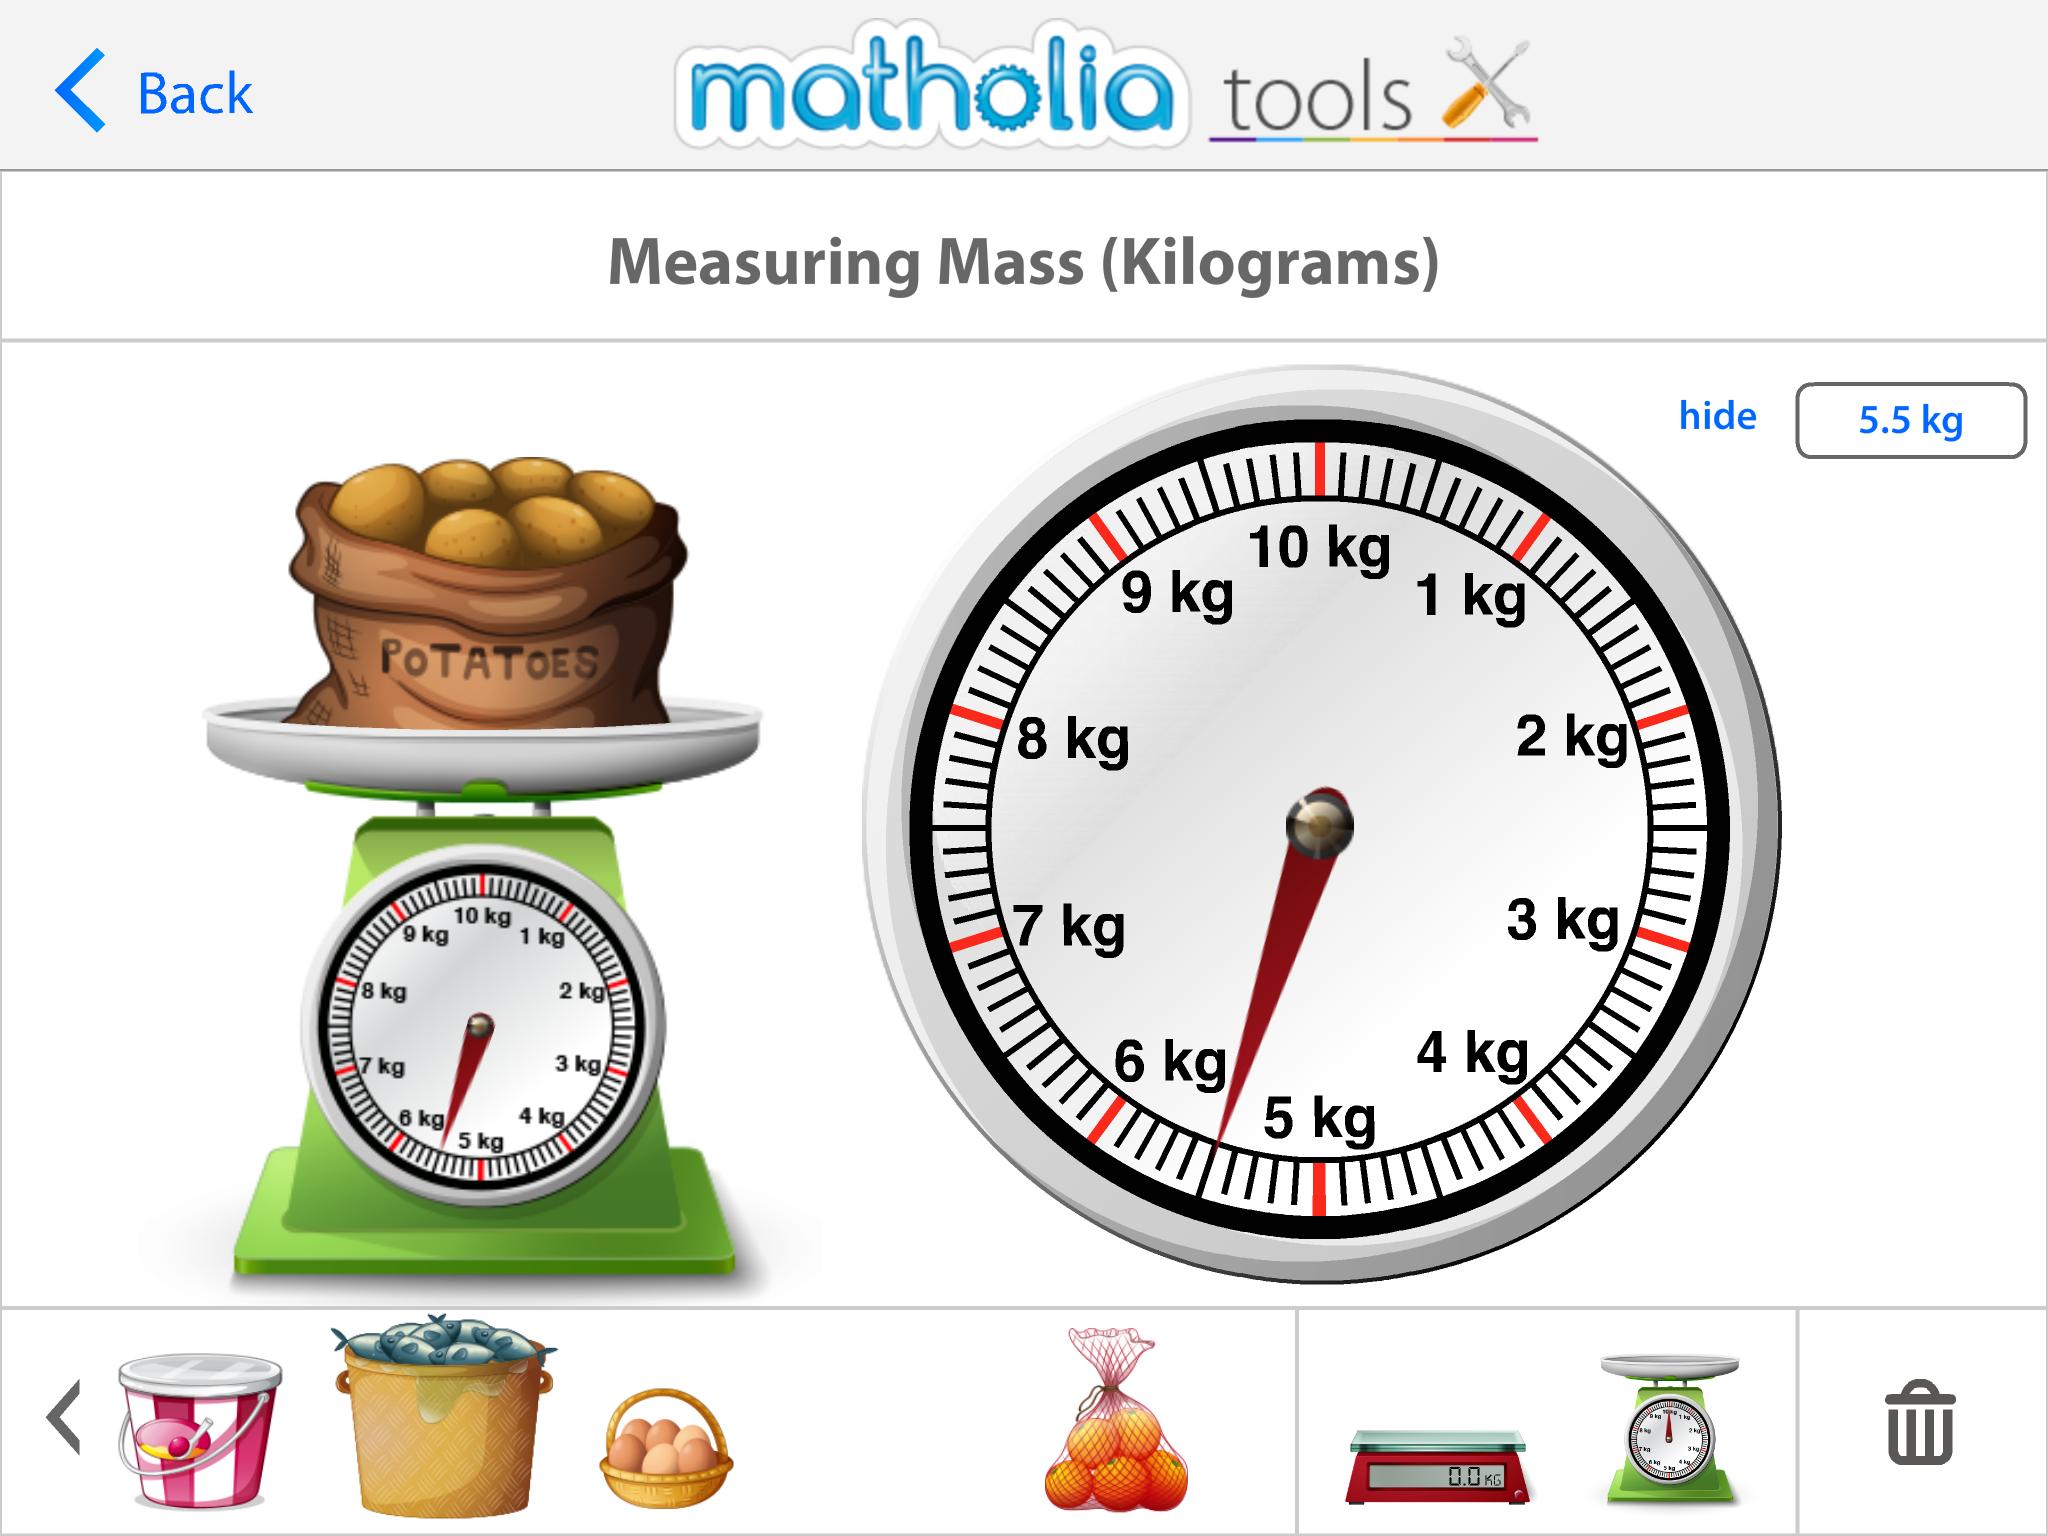 Matholia Tools Measuring Mass Kilograms Play To Learn Measuring Mass Singapore Math [ 1536 x 2048 Pixel ]